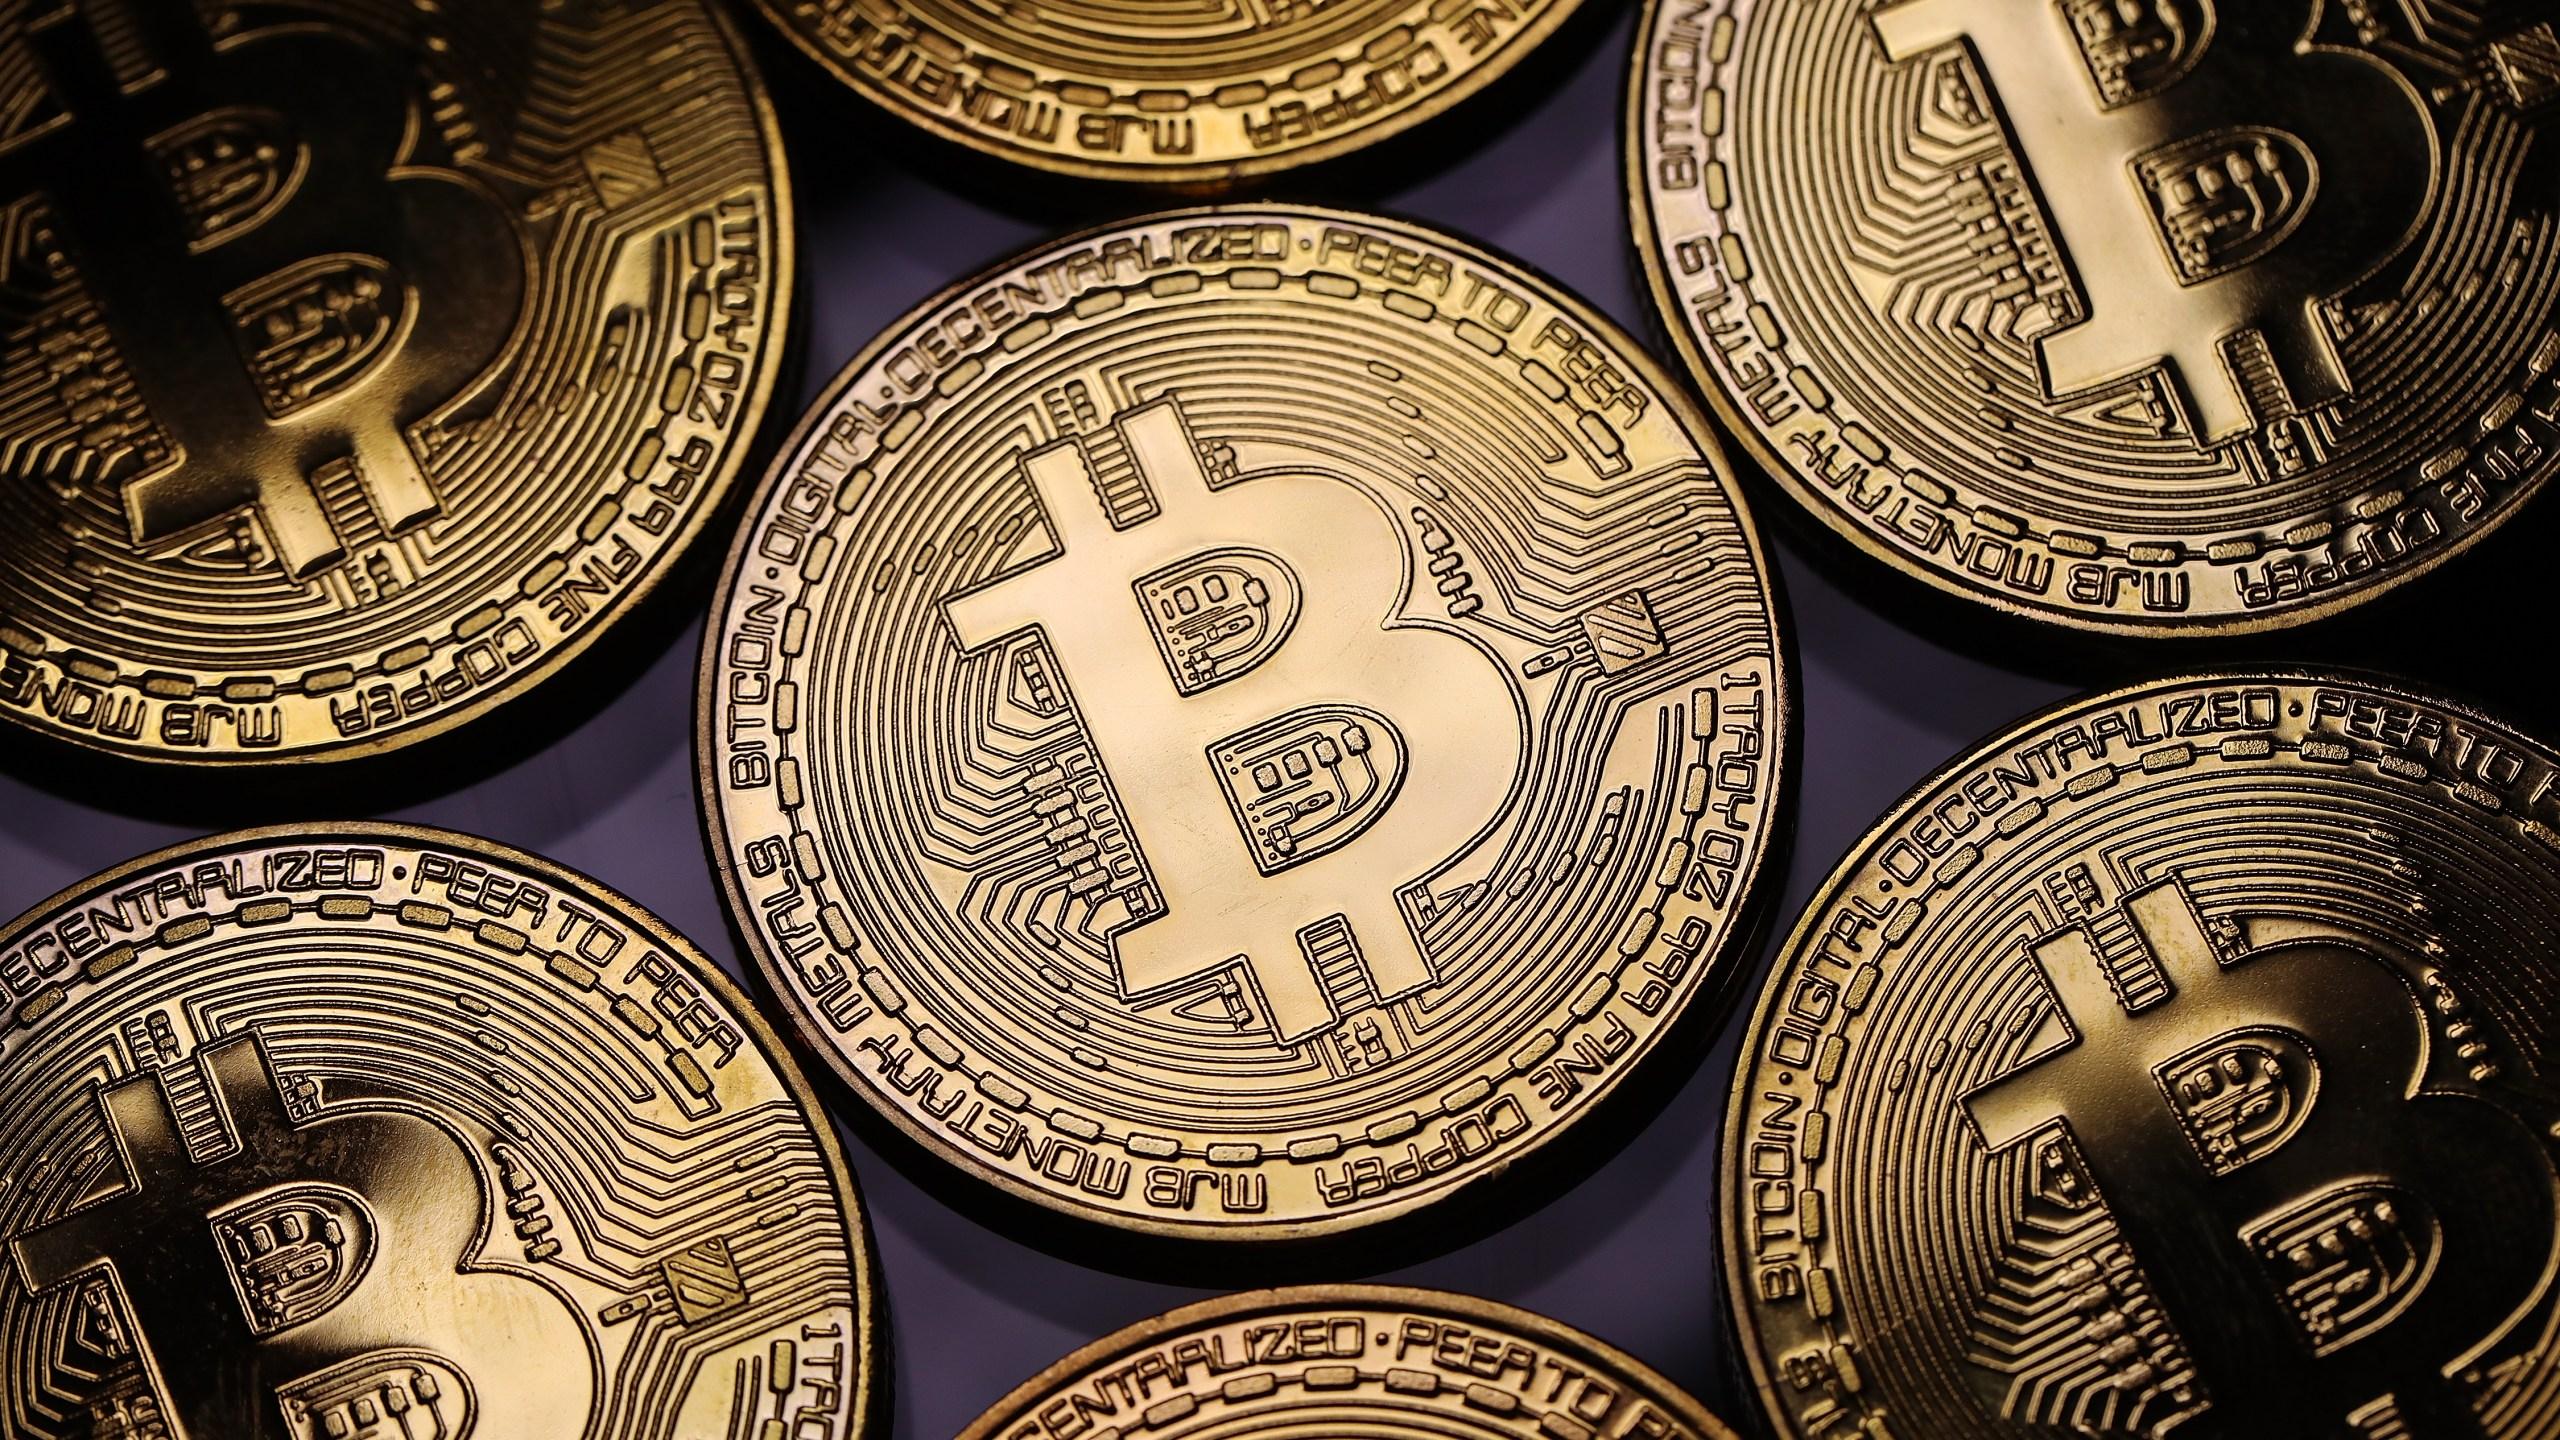 Inside bitcoins new york 2021 ballot world grand prix darts 2021 betting websites